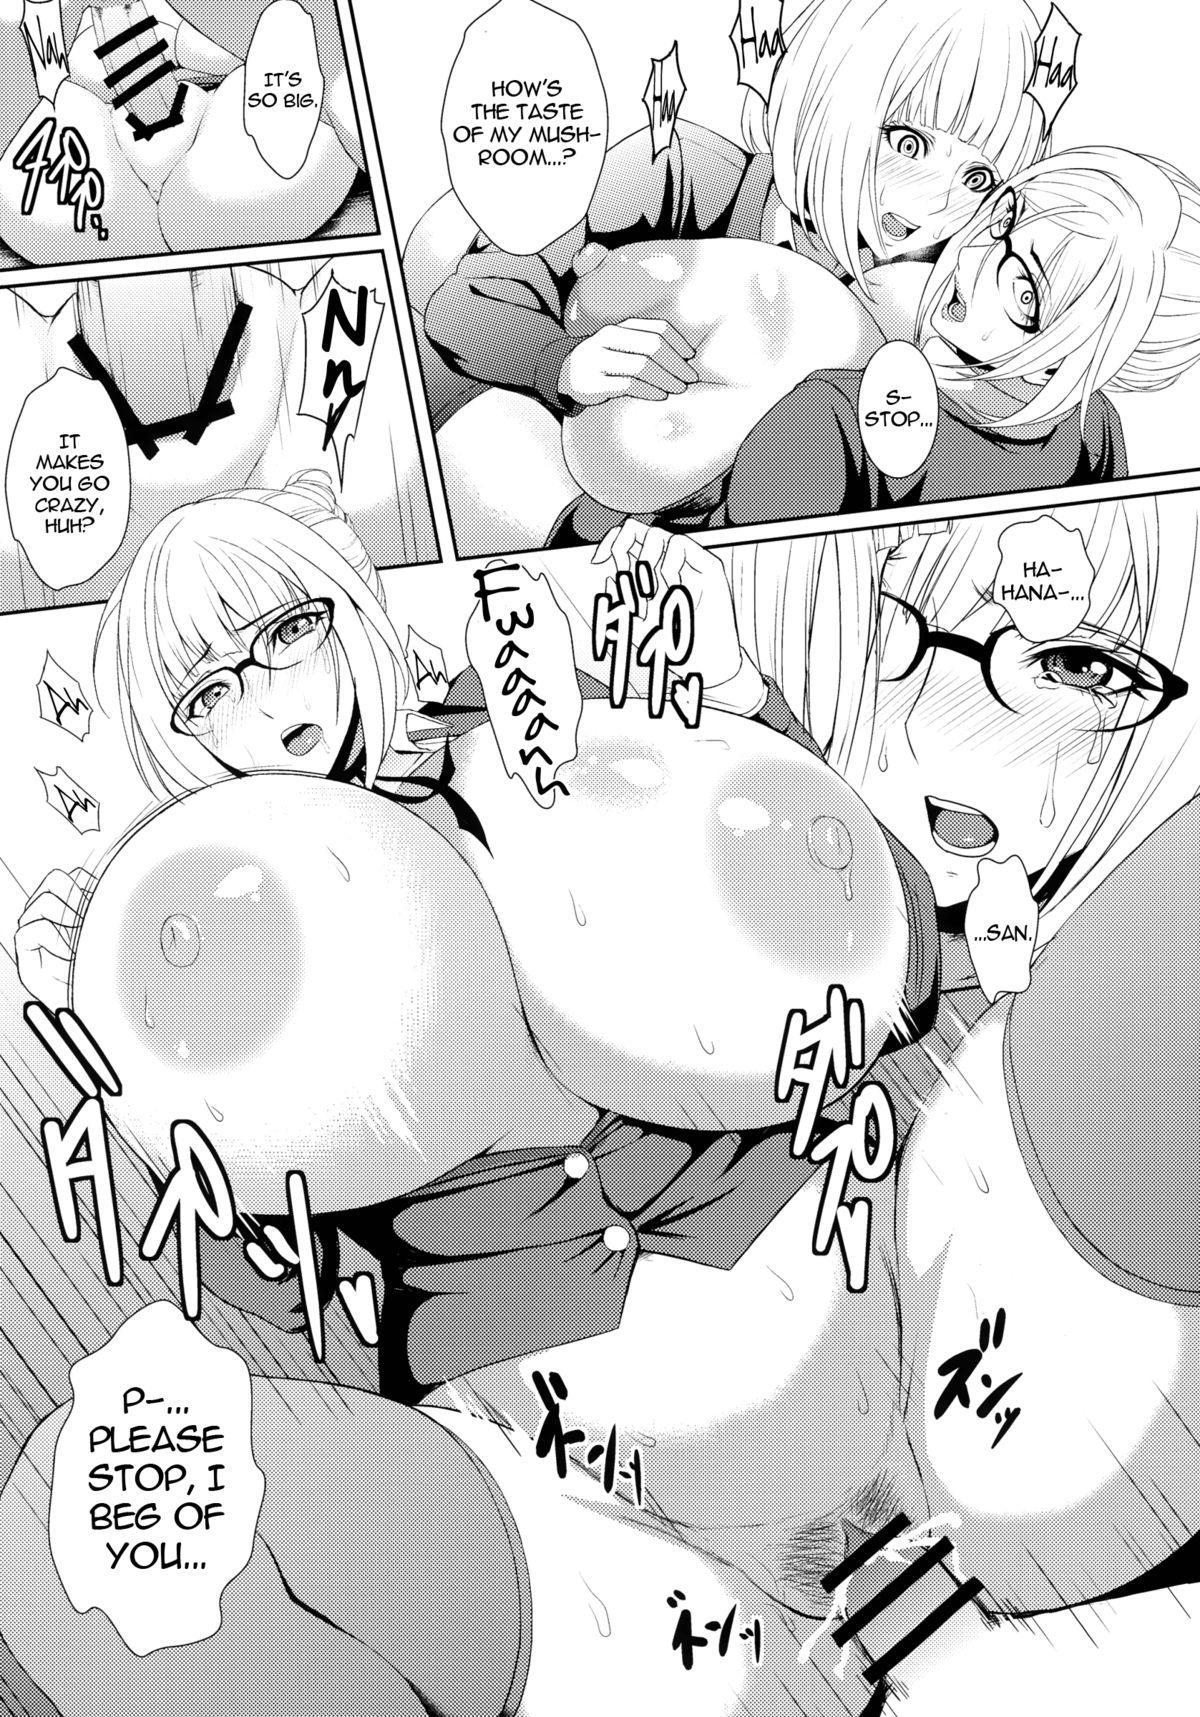 Kangoku ni Sakuhana to Hana - The Belle and Flower in prison 18